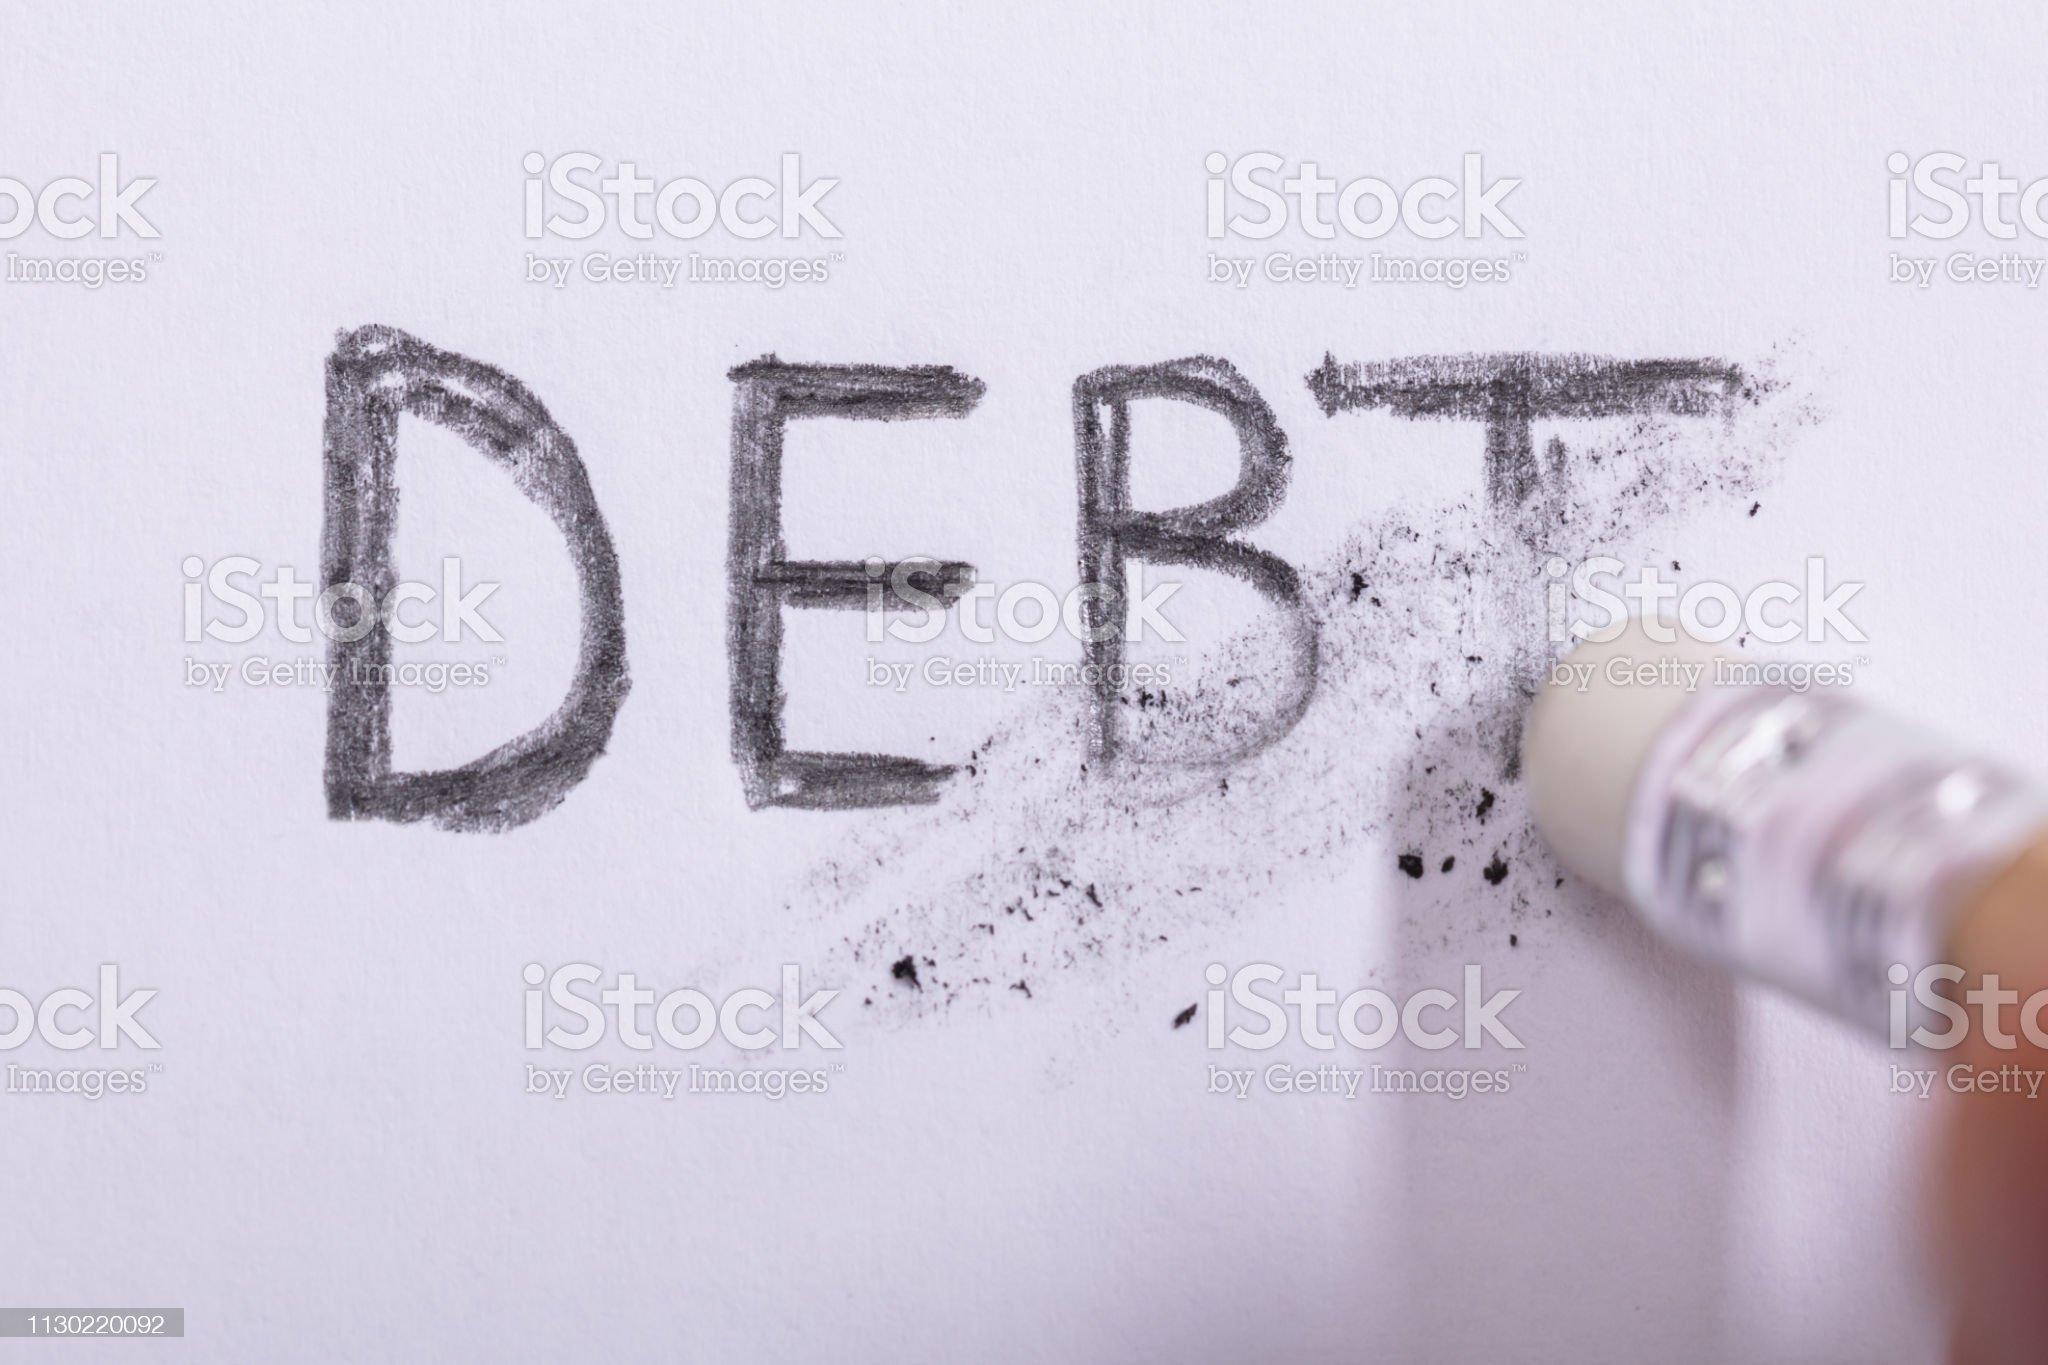 Pencil Eraser Erasing Debt Word Close-up Of Pencil Eraser Erasing Debt Word On White Paper Debt Stock Photo Bad Debts